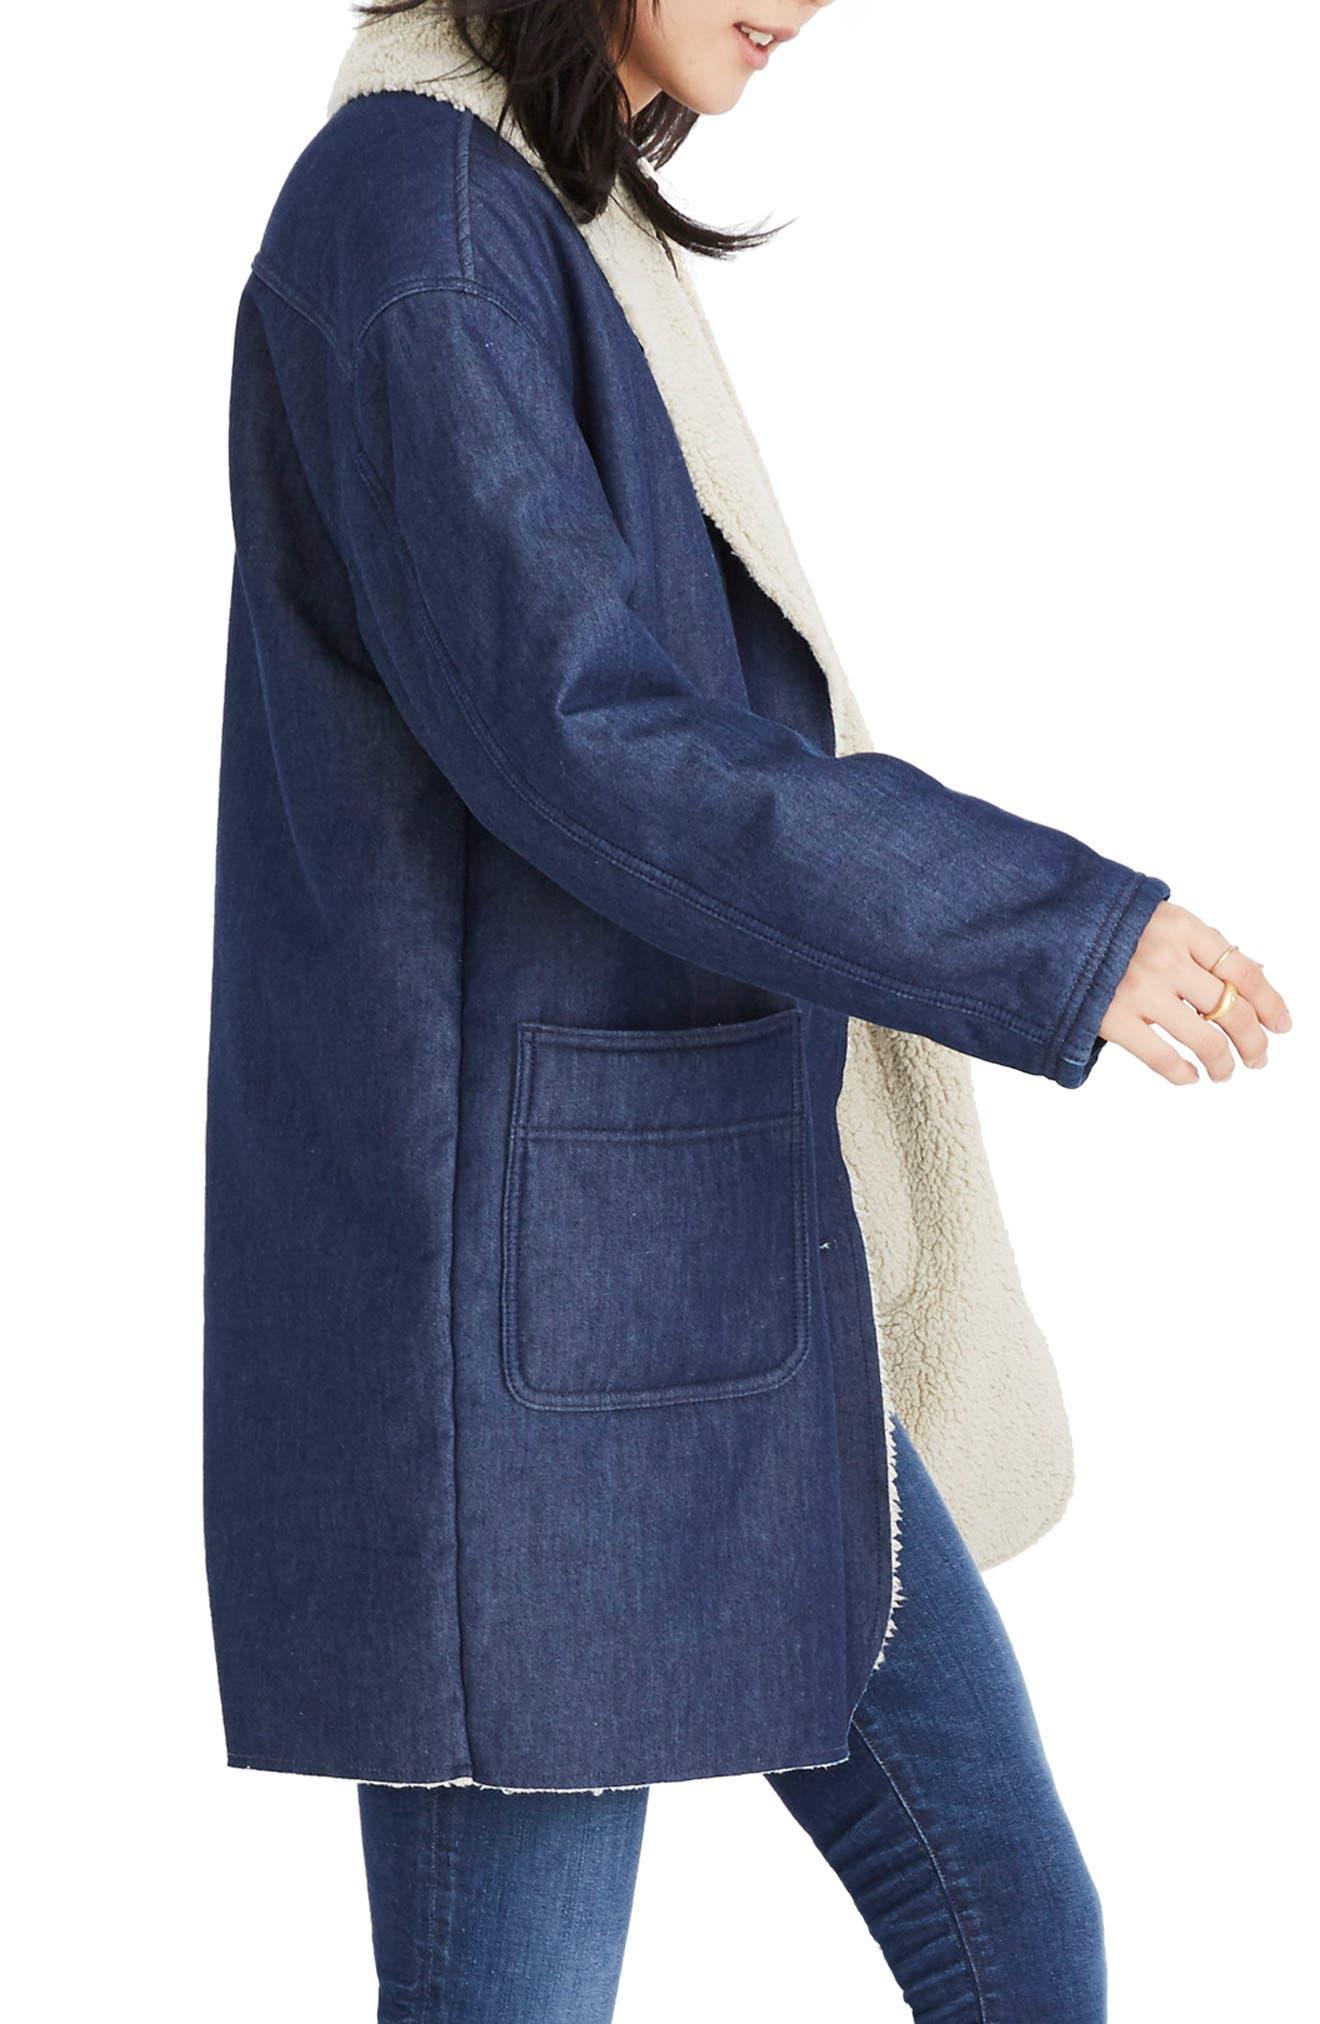 MADEWELL, Fleece Trim Denim Cocoon Coat, Alternate thumbnail 4, color, BRUNSWICK WASH